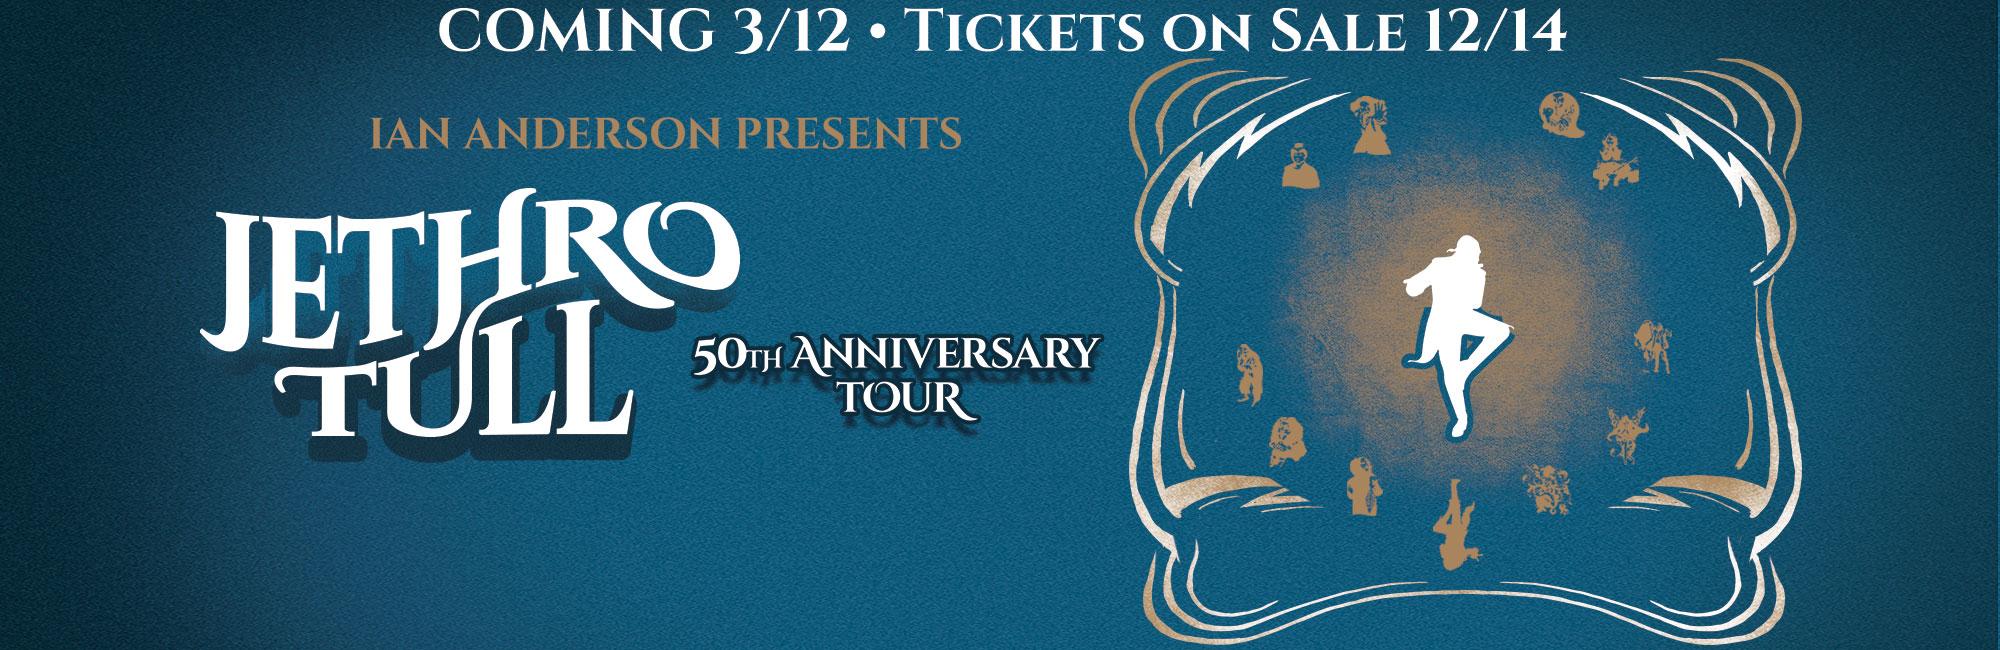 Ian Anderson Presents Jethro Tull: 50th Anniversary Tour